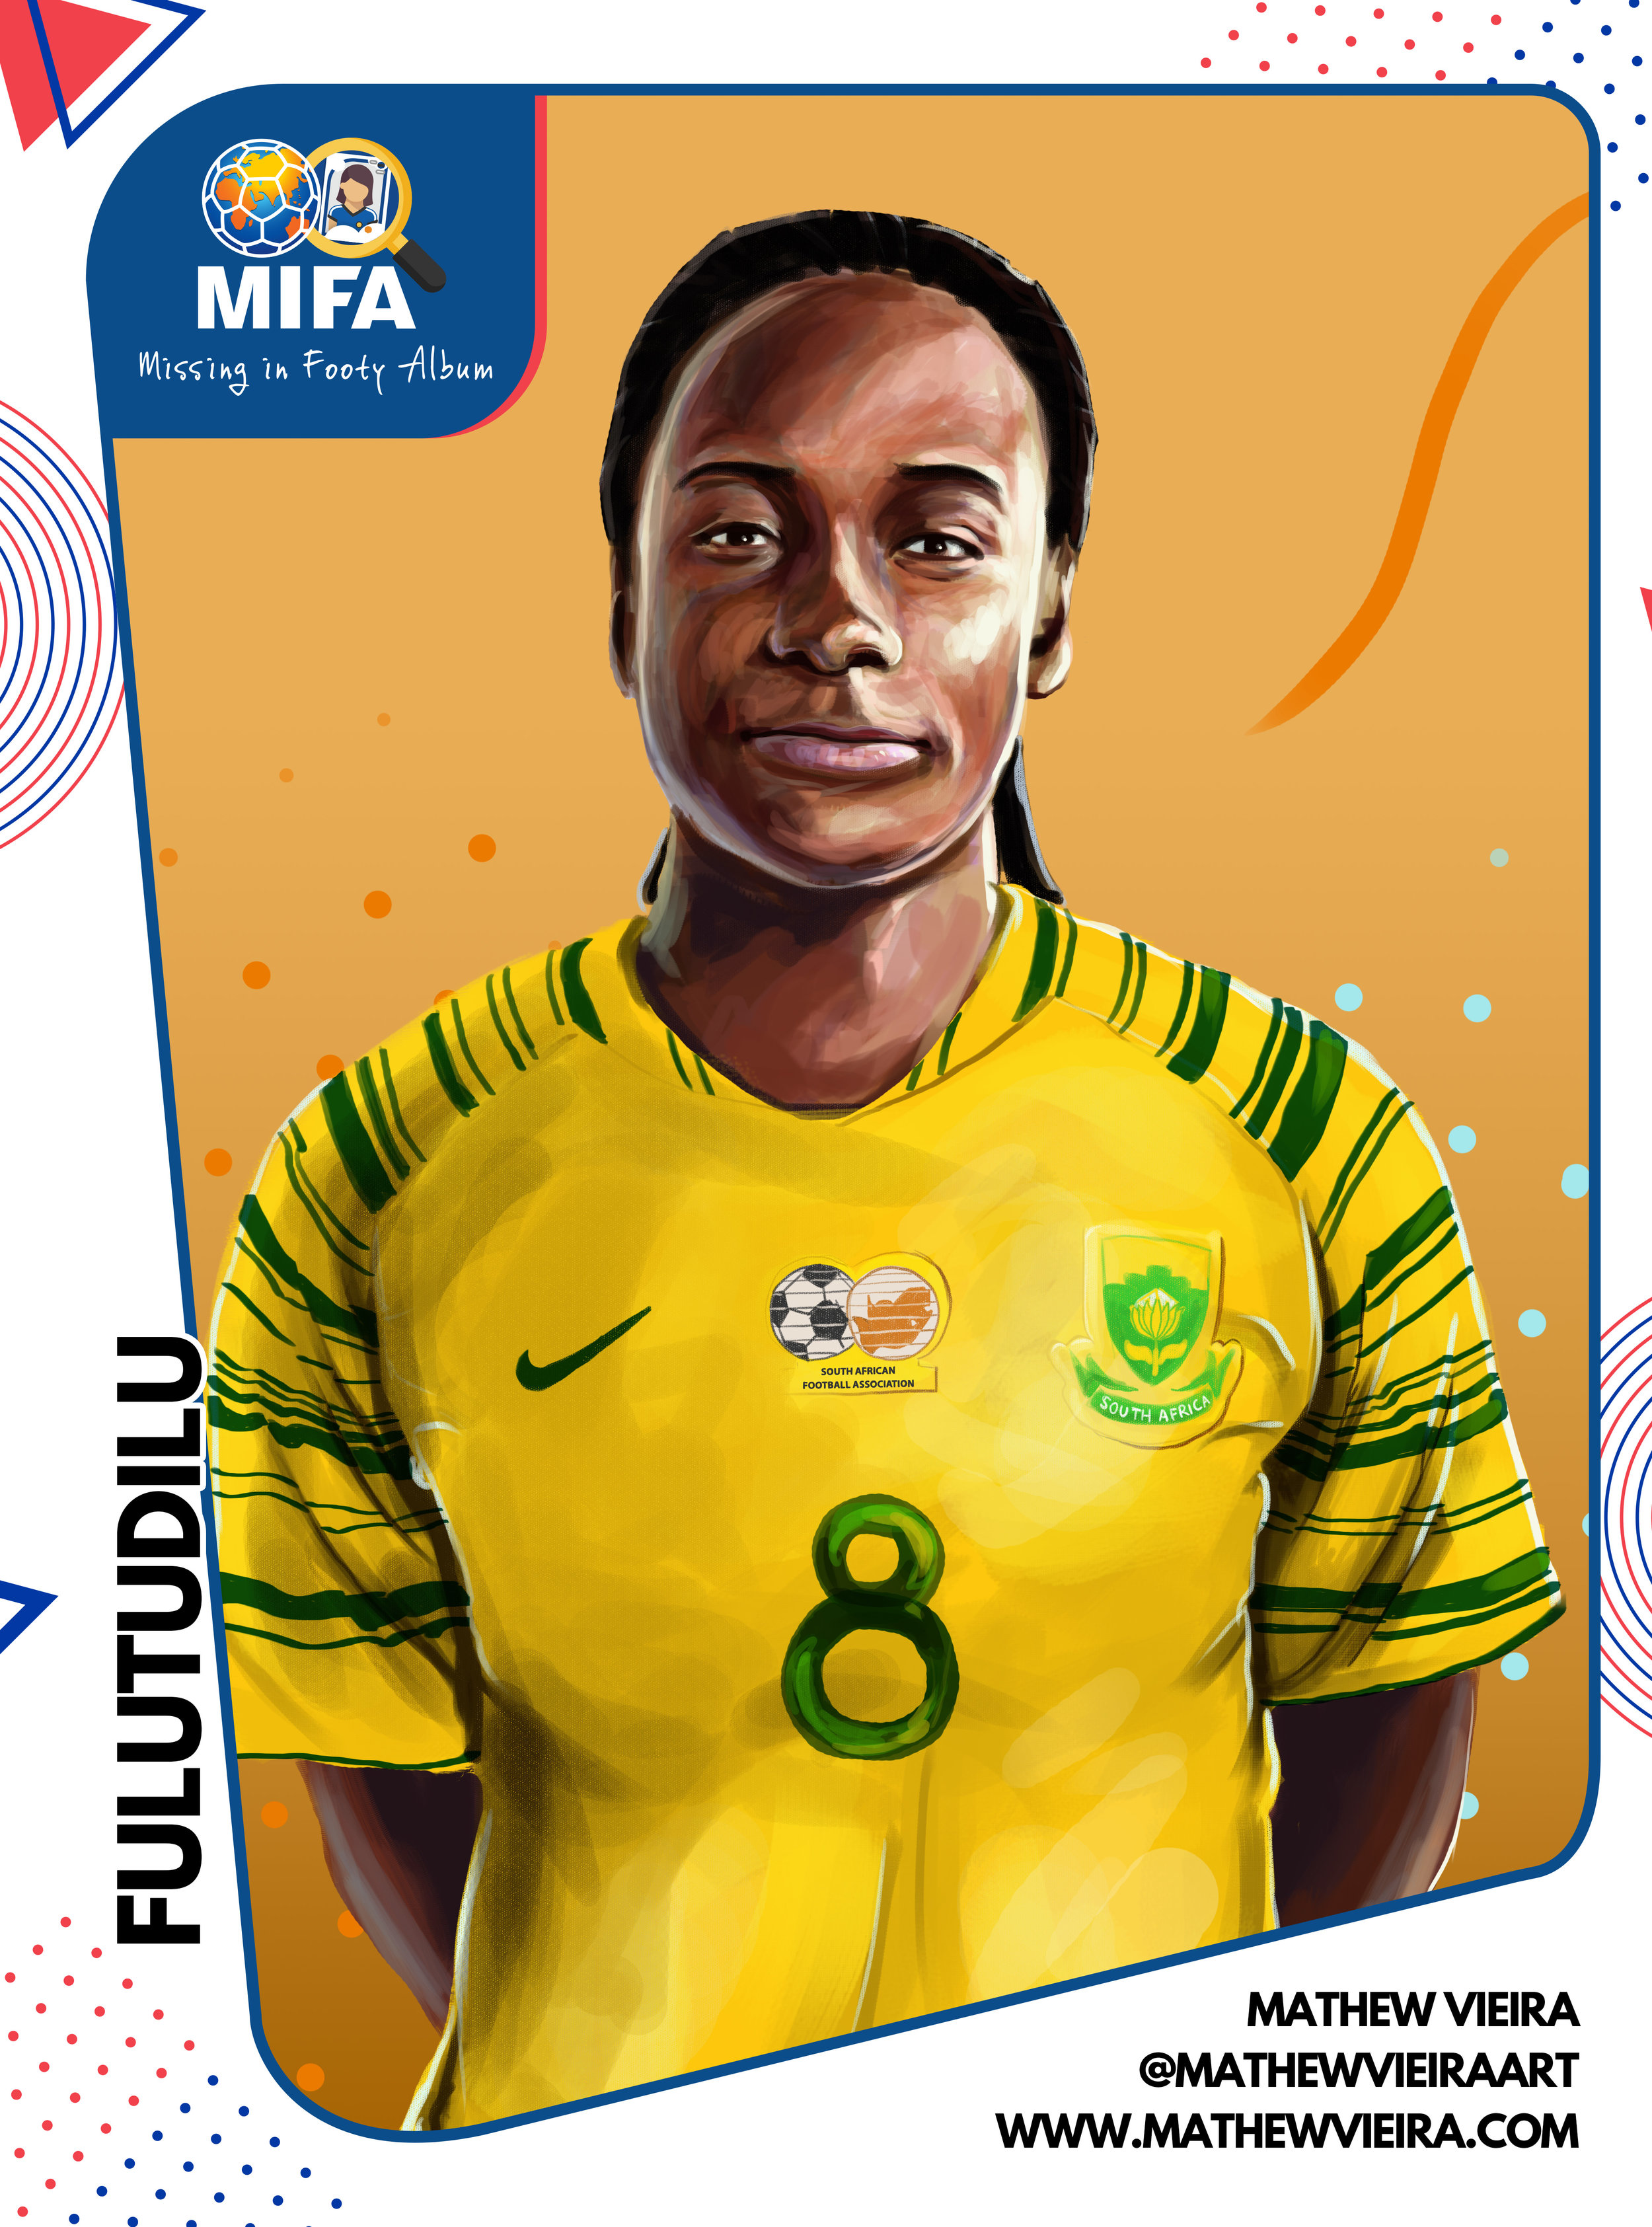 MIFA 2019 Fulutudilu_by Mathew Vieira.jpg